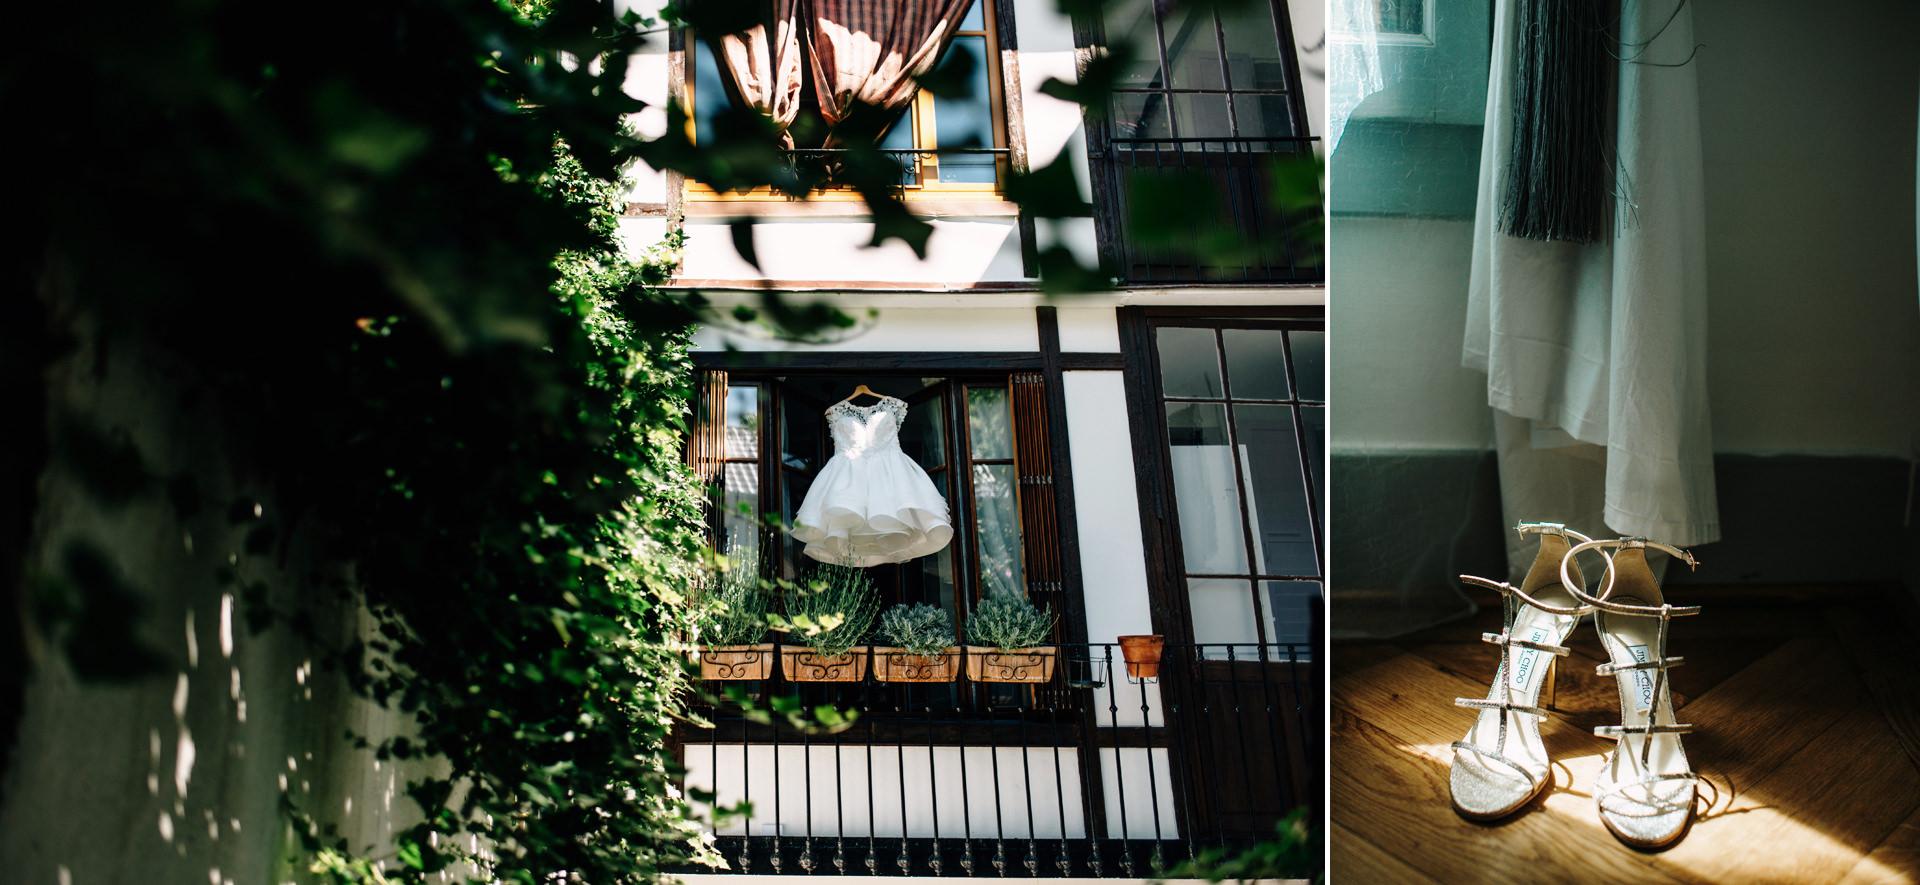 Magdalena & Sacha - Evian les Bains - France Wedding Photographer 7